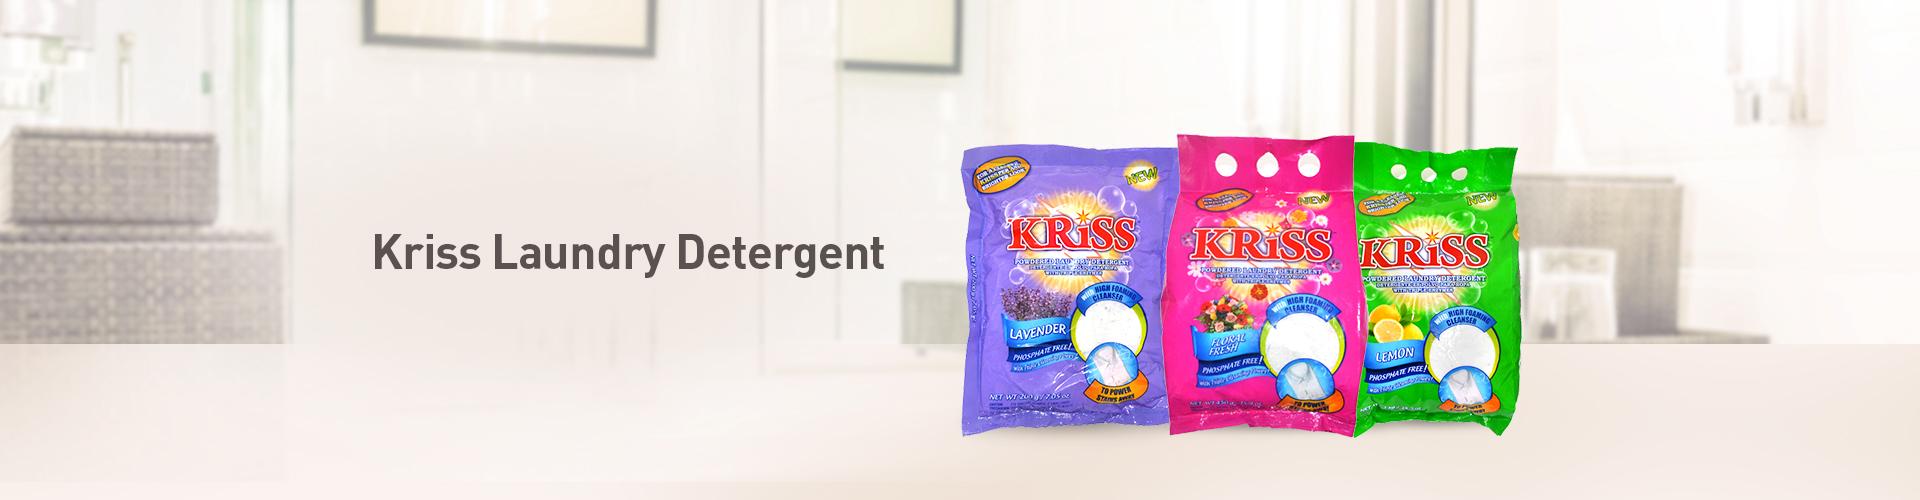 KRISS Laundry Detergent